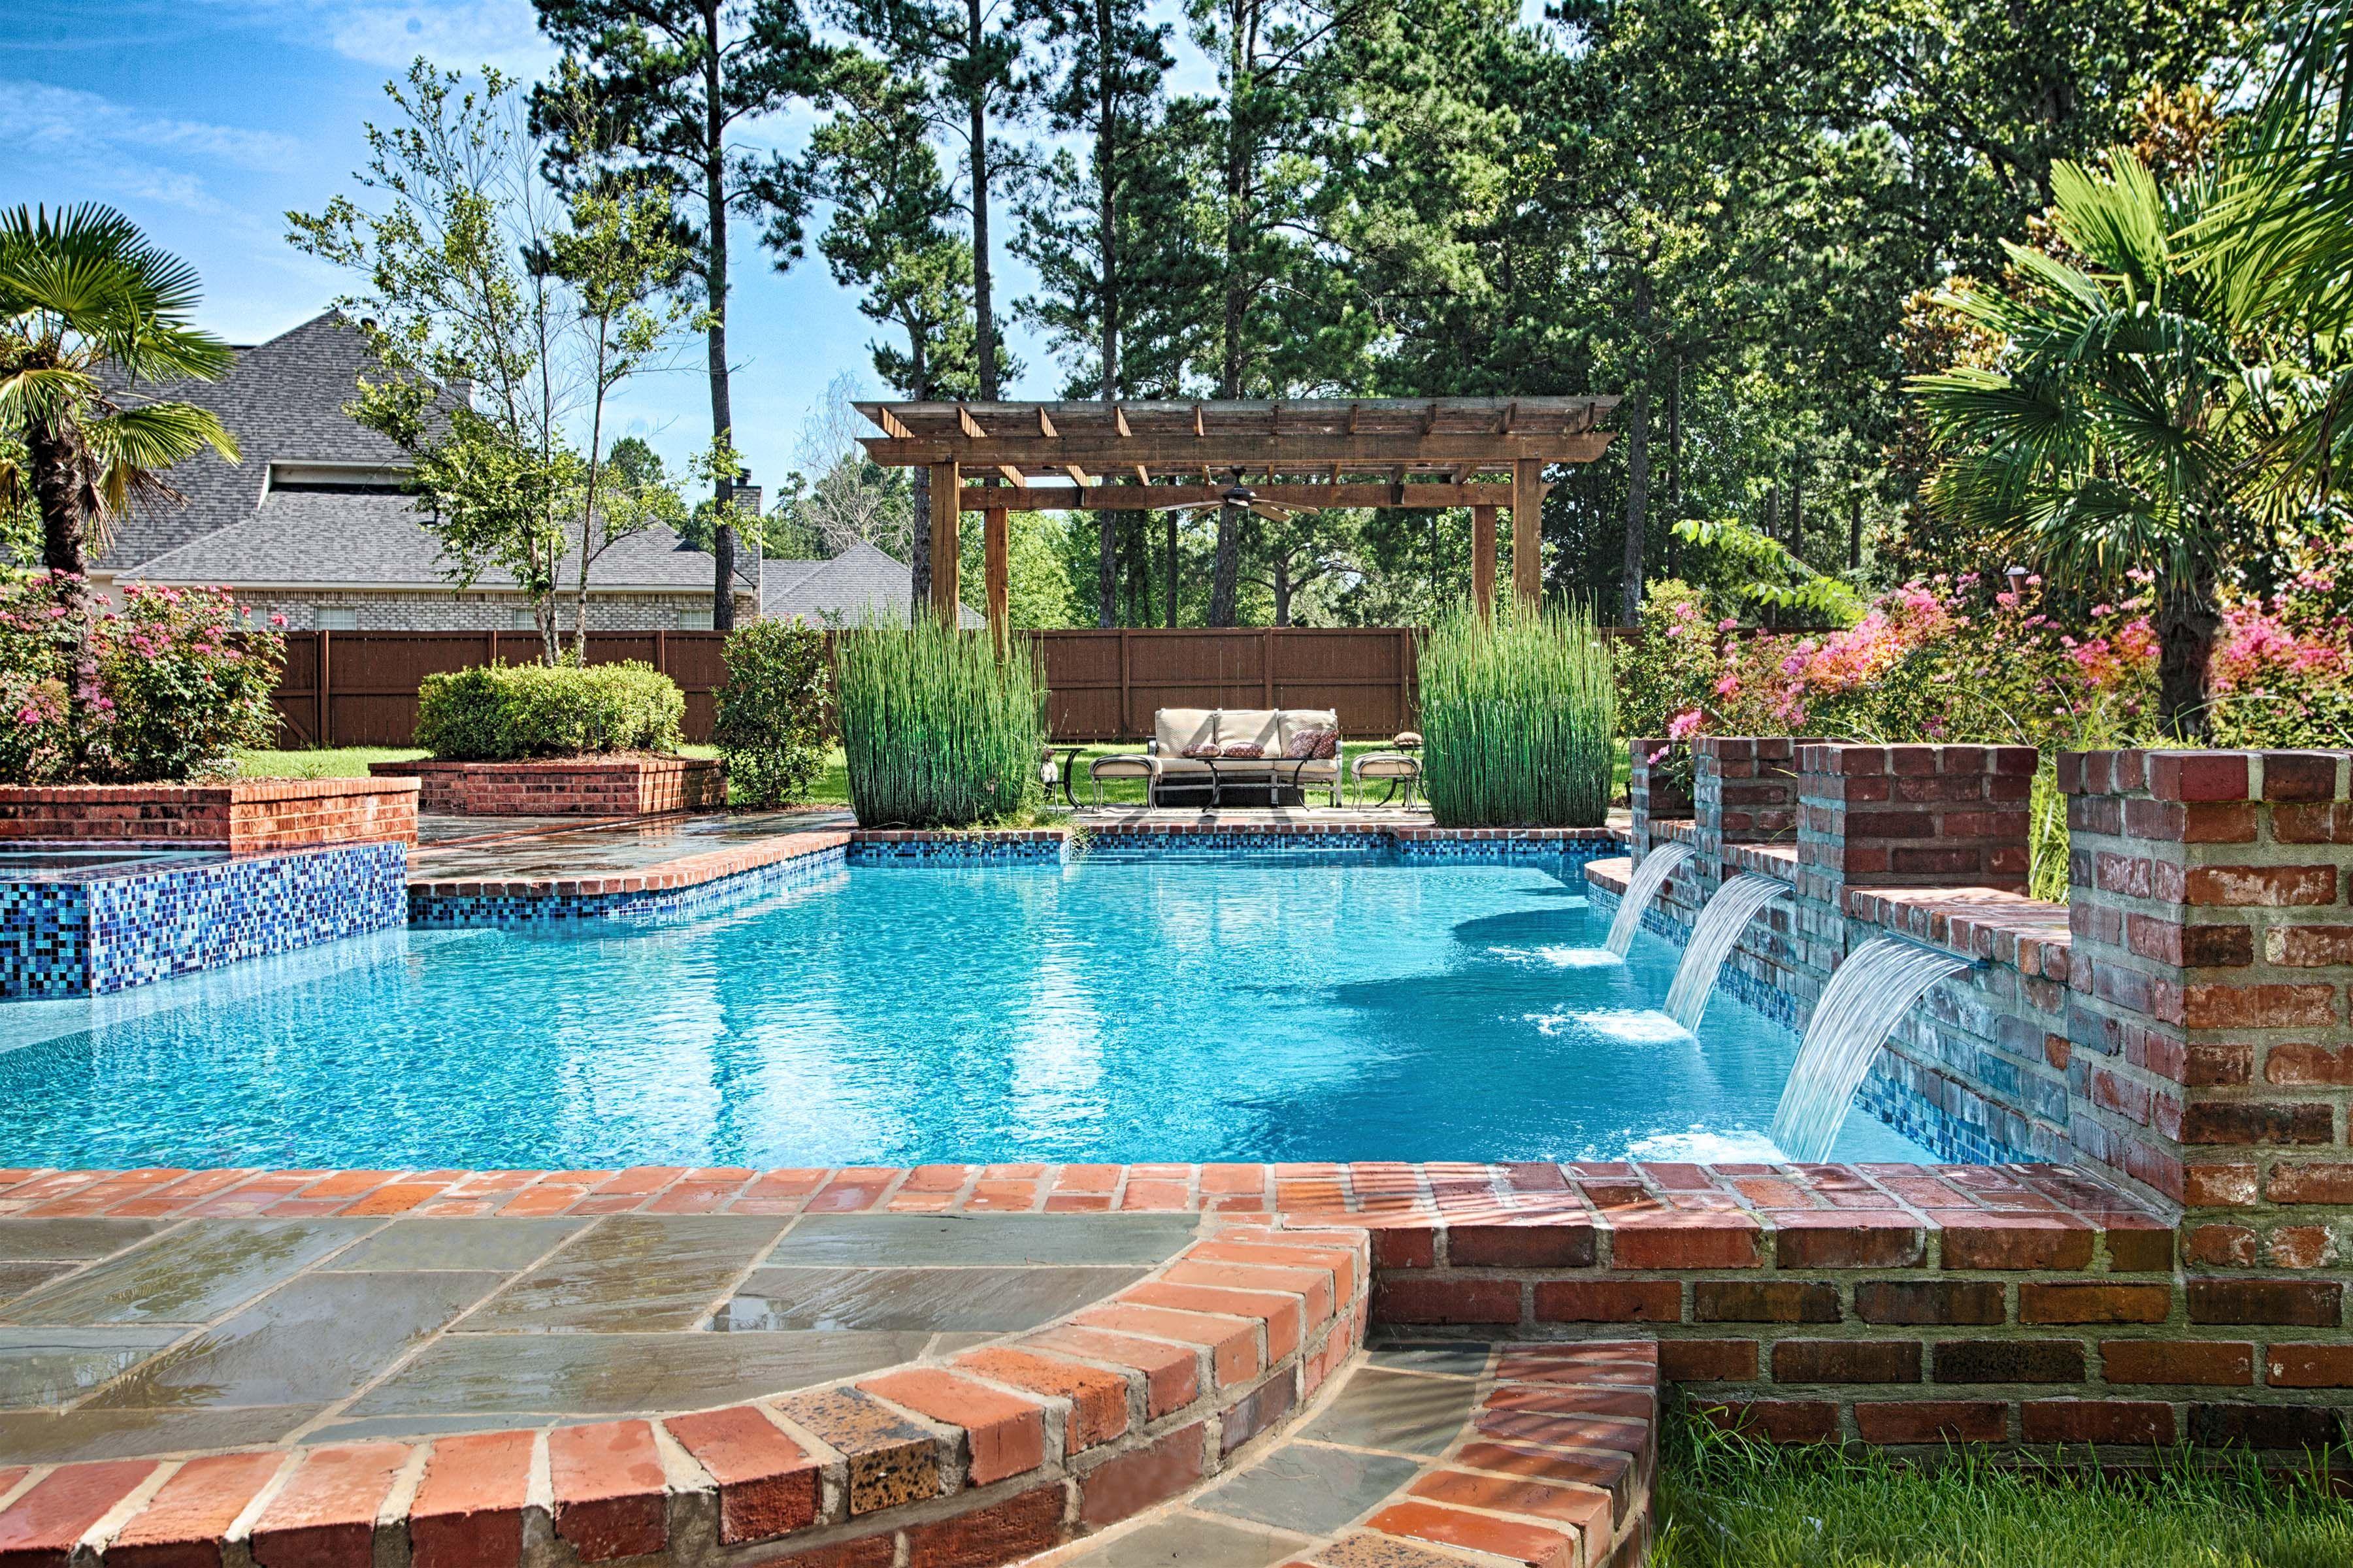 Bossier City Pool Design Shreveport Pool Construction outdoor